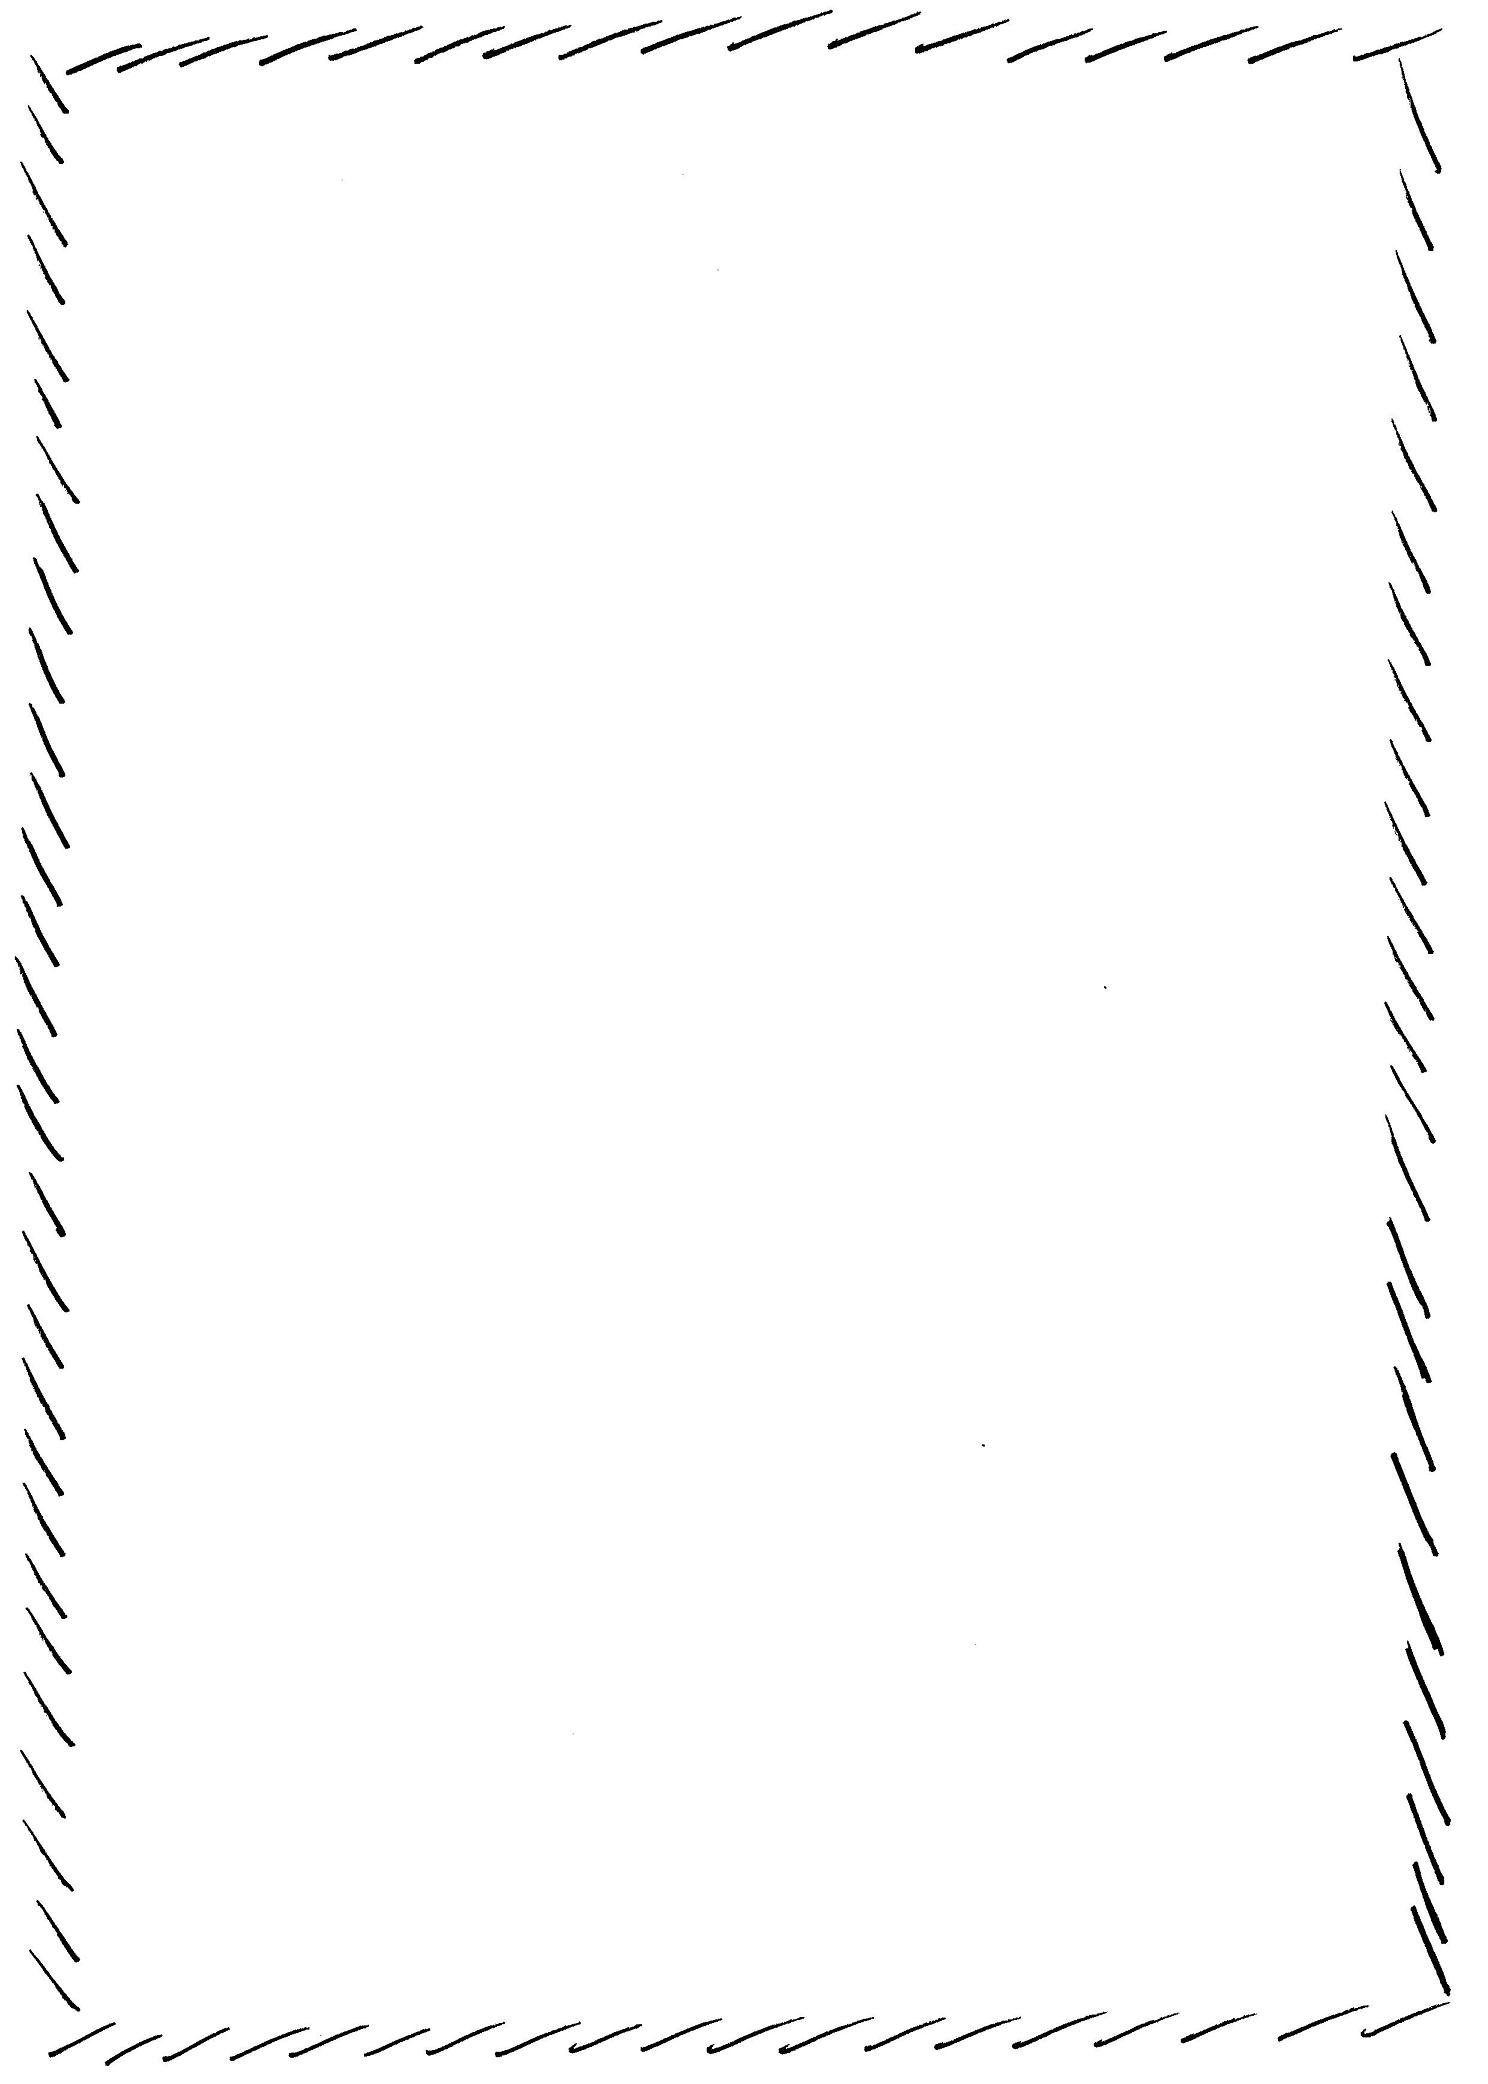 cadres et bordures | Frame pattern | Pinterest | Cadres ...